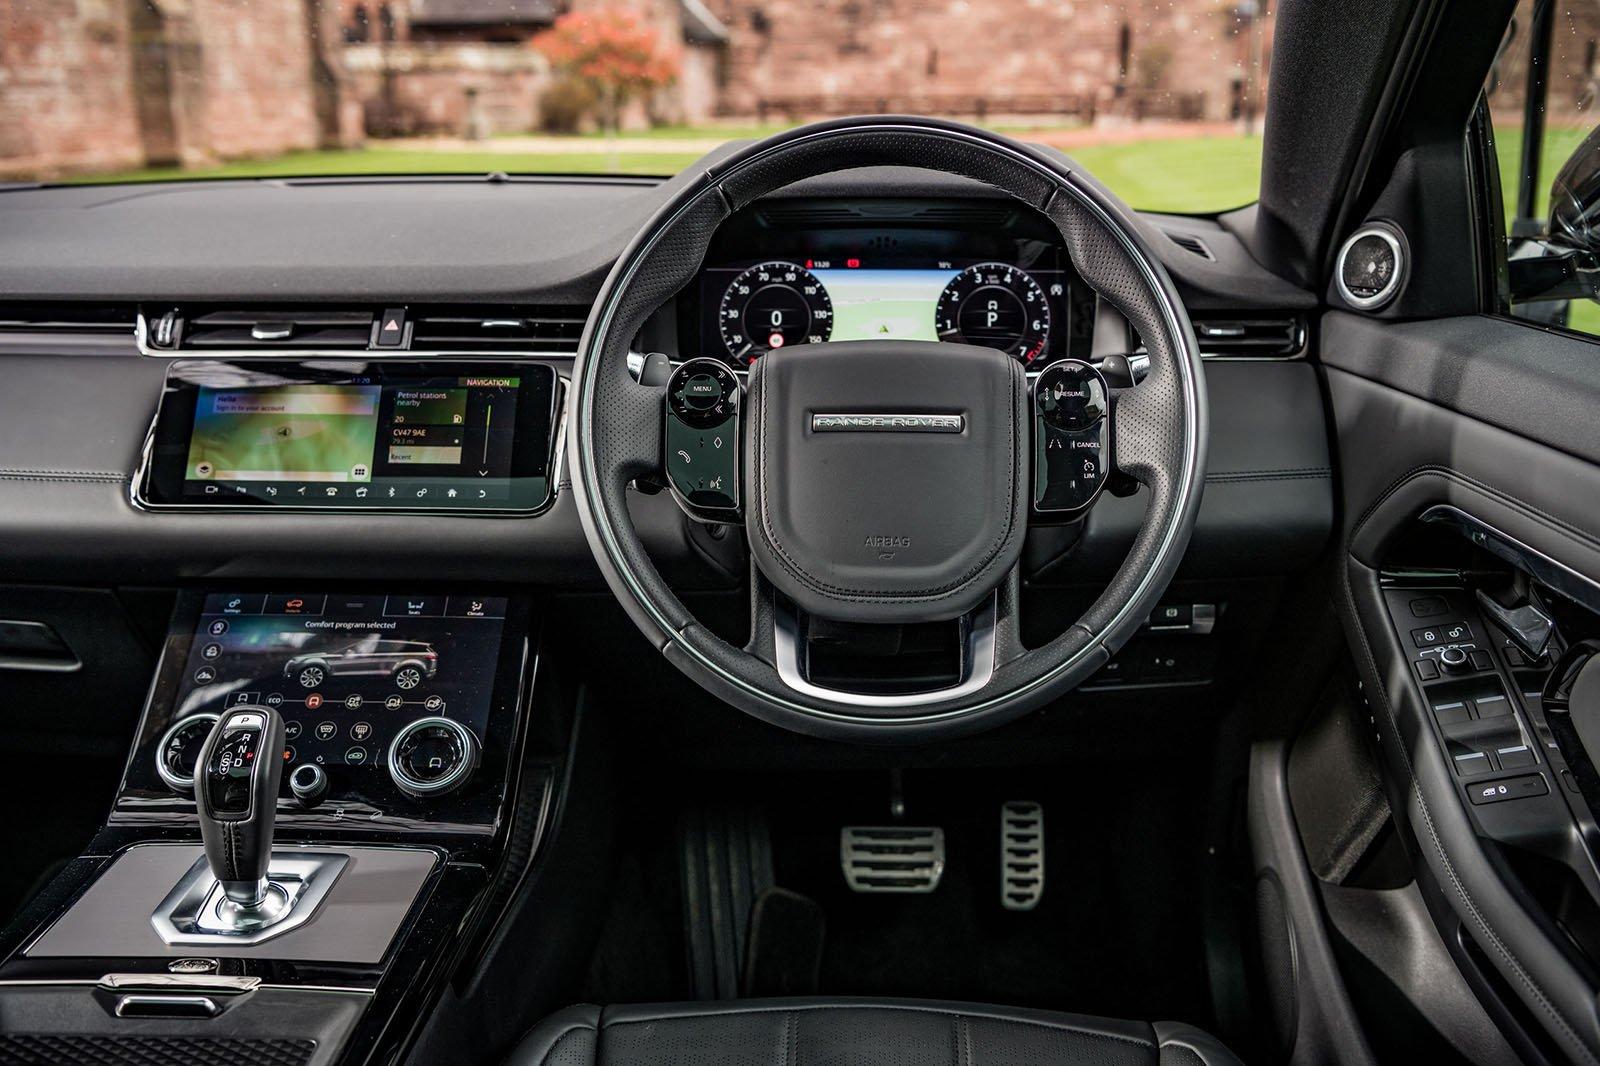 Range Rover Evoque 2.0 D150 2WD - interior